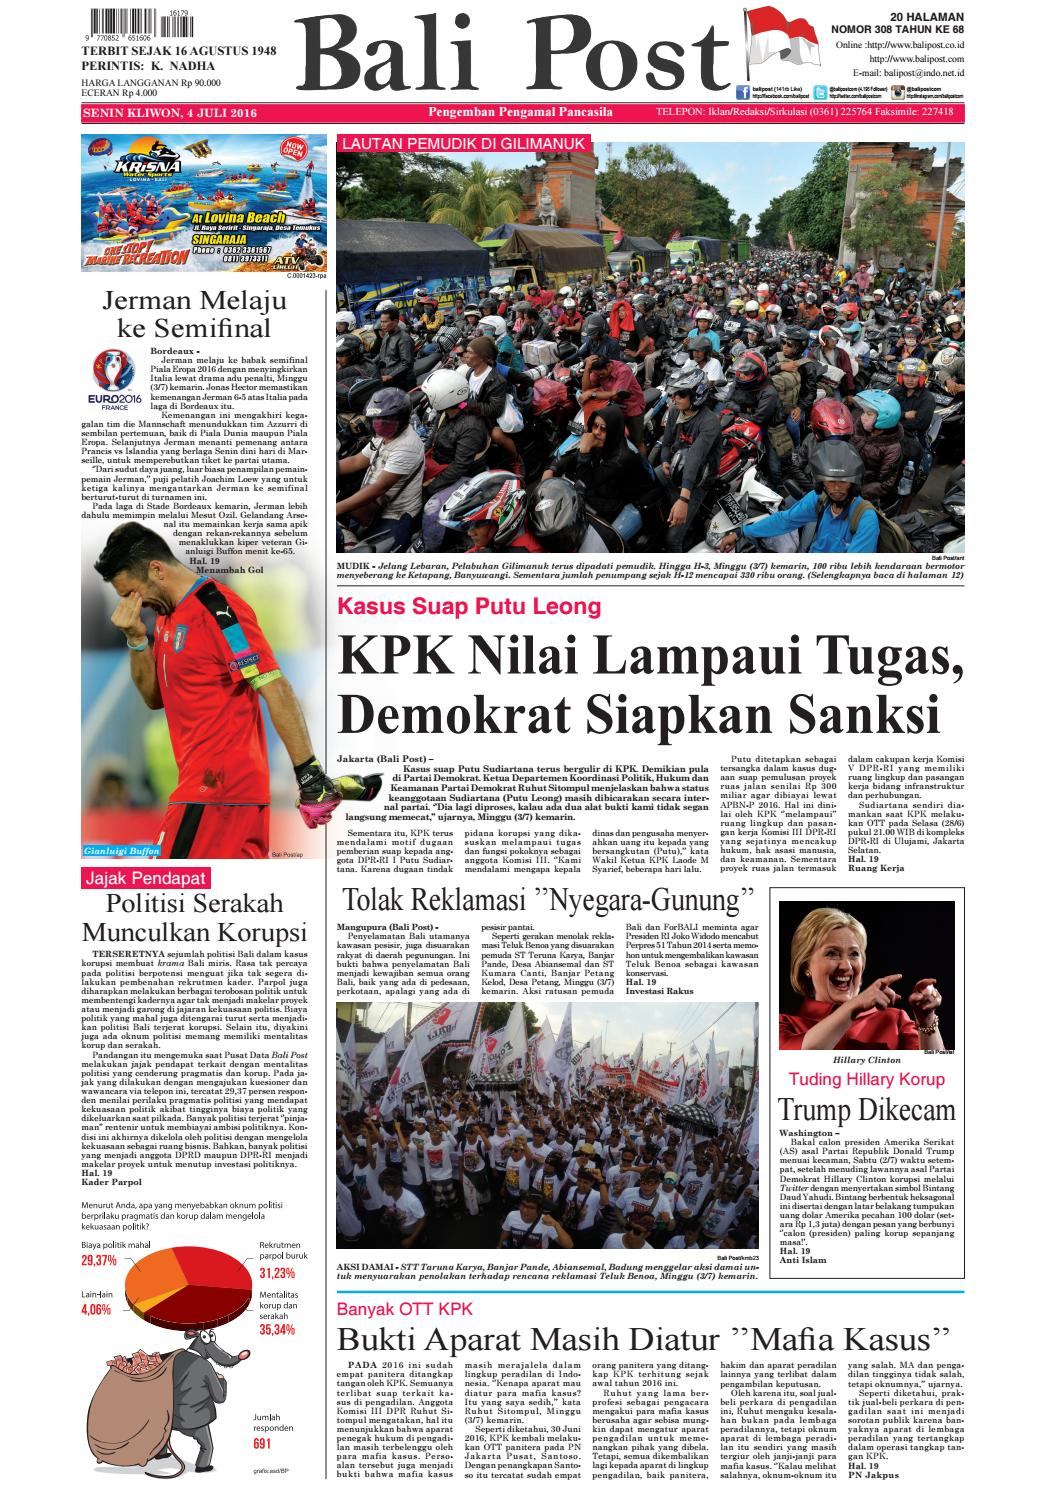 Edisi 4 Juli 2016 Balipostcom By E Paper Kmb Issuu Prom Open Trip Pulau Pari Part Tgl 7 8 2018